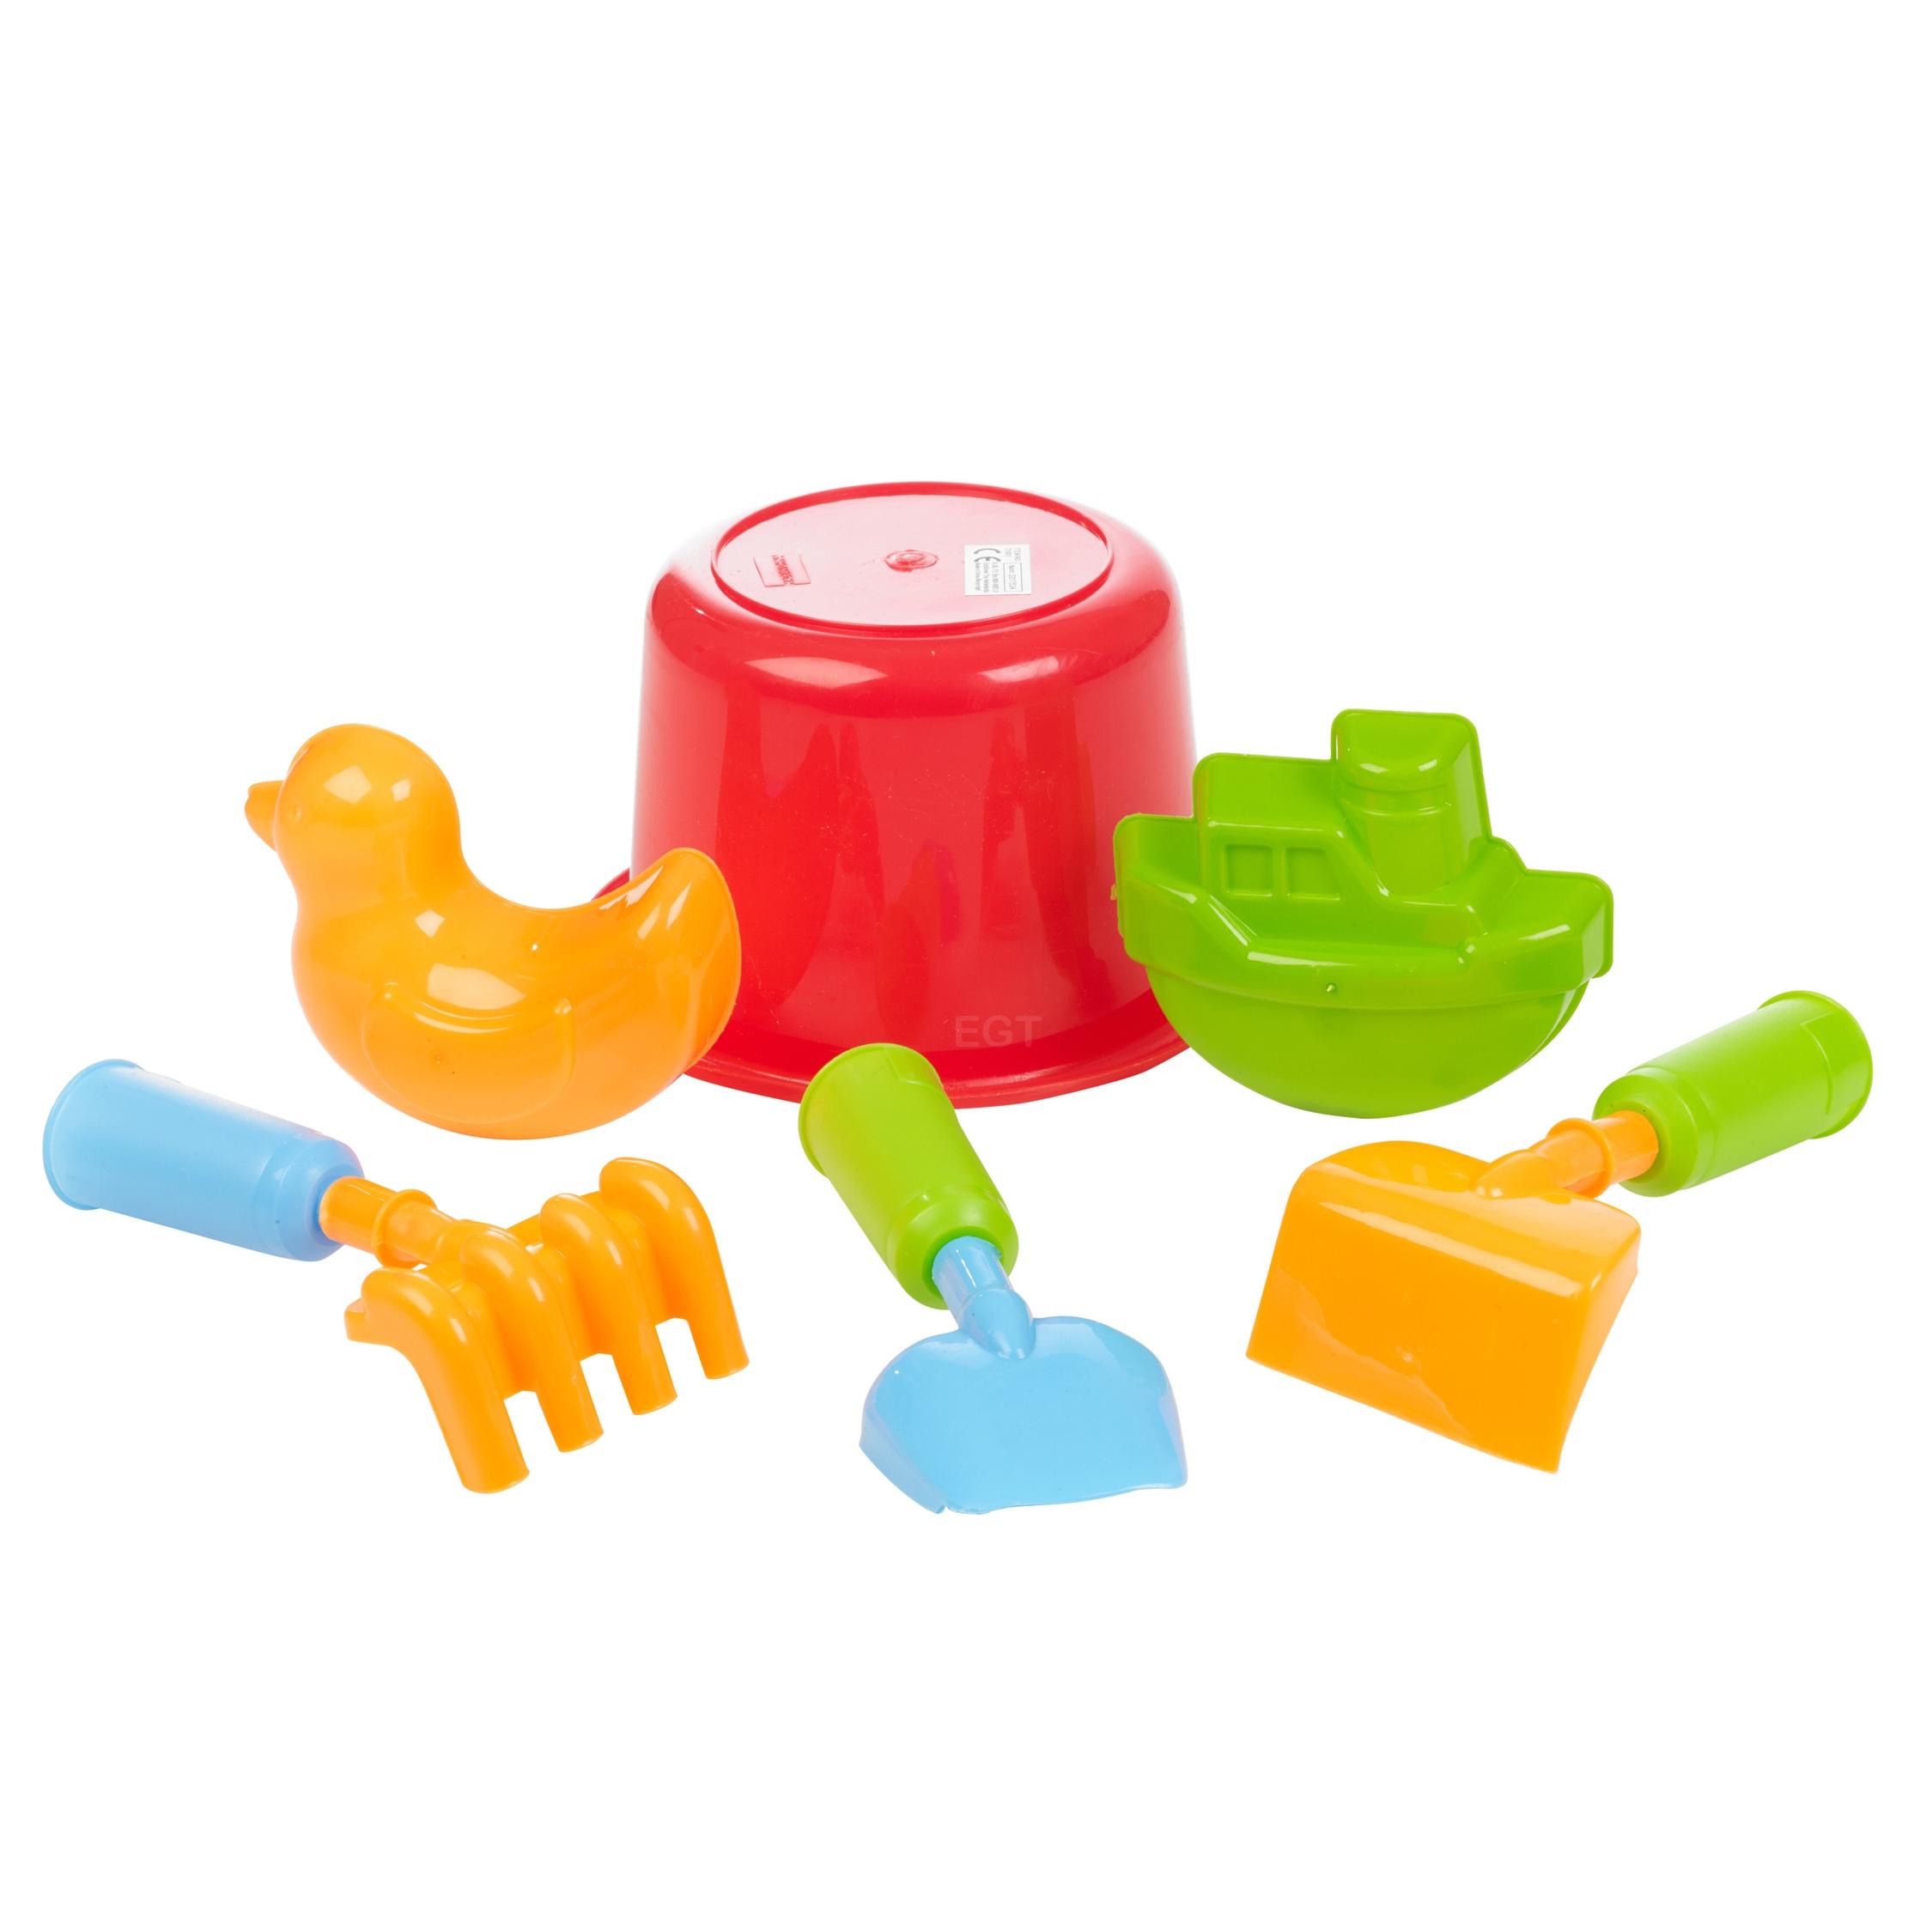 Beach Sand Toys For Kids : Sand castle bucket spade kids beach seaside play water